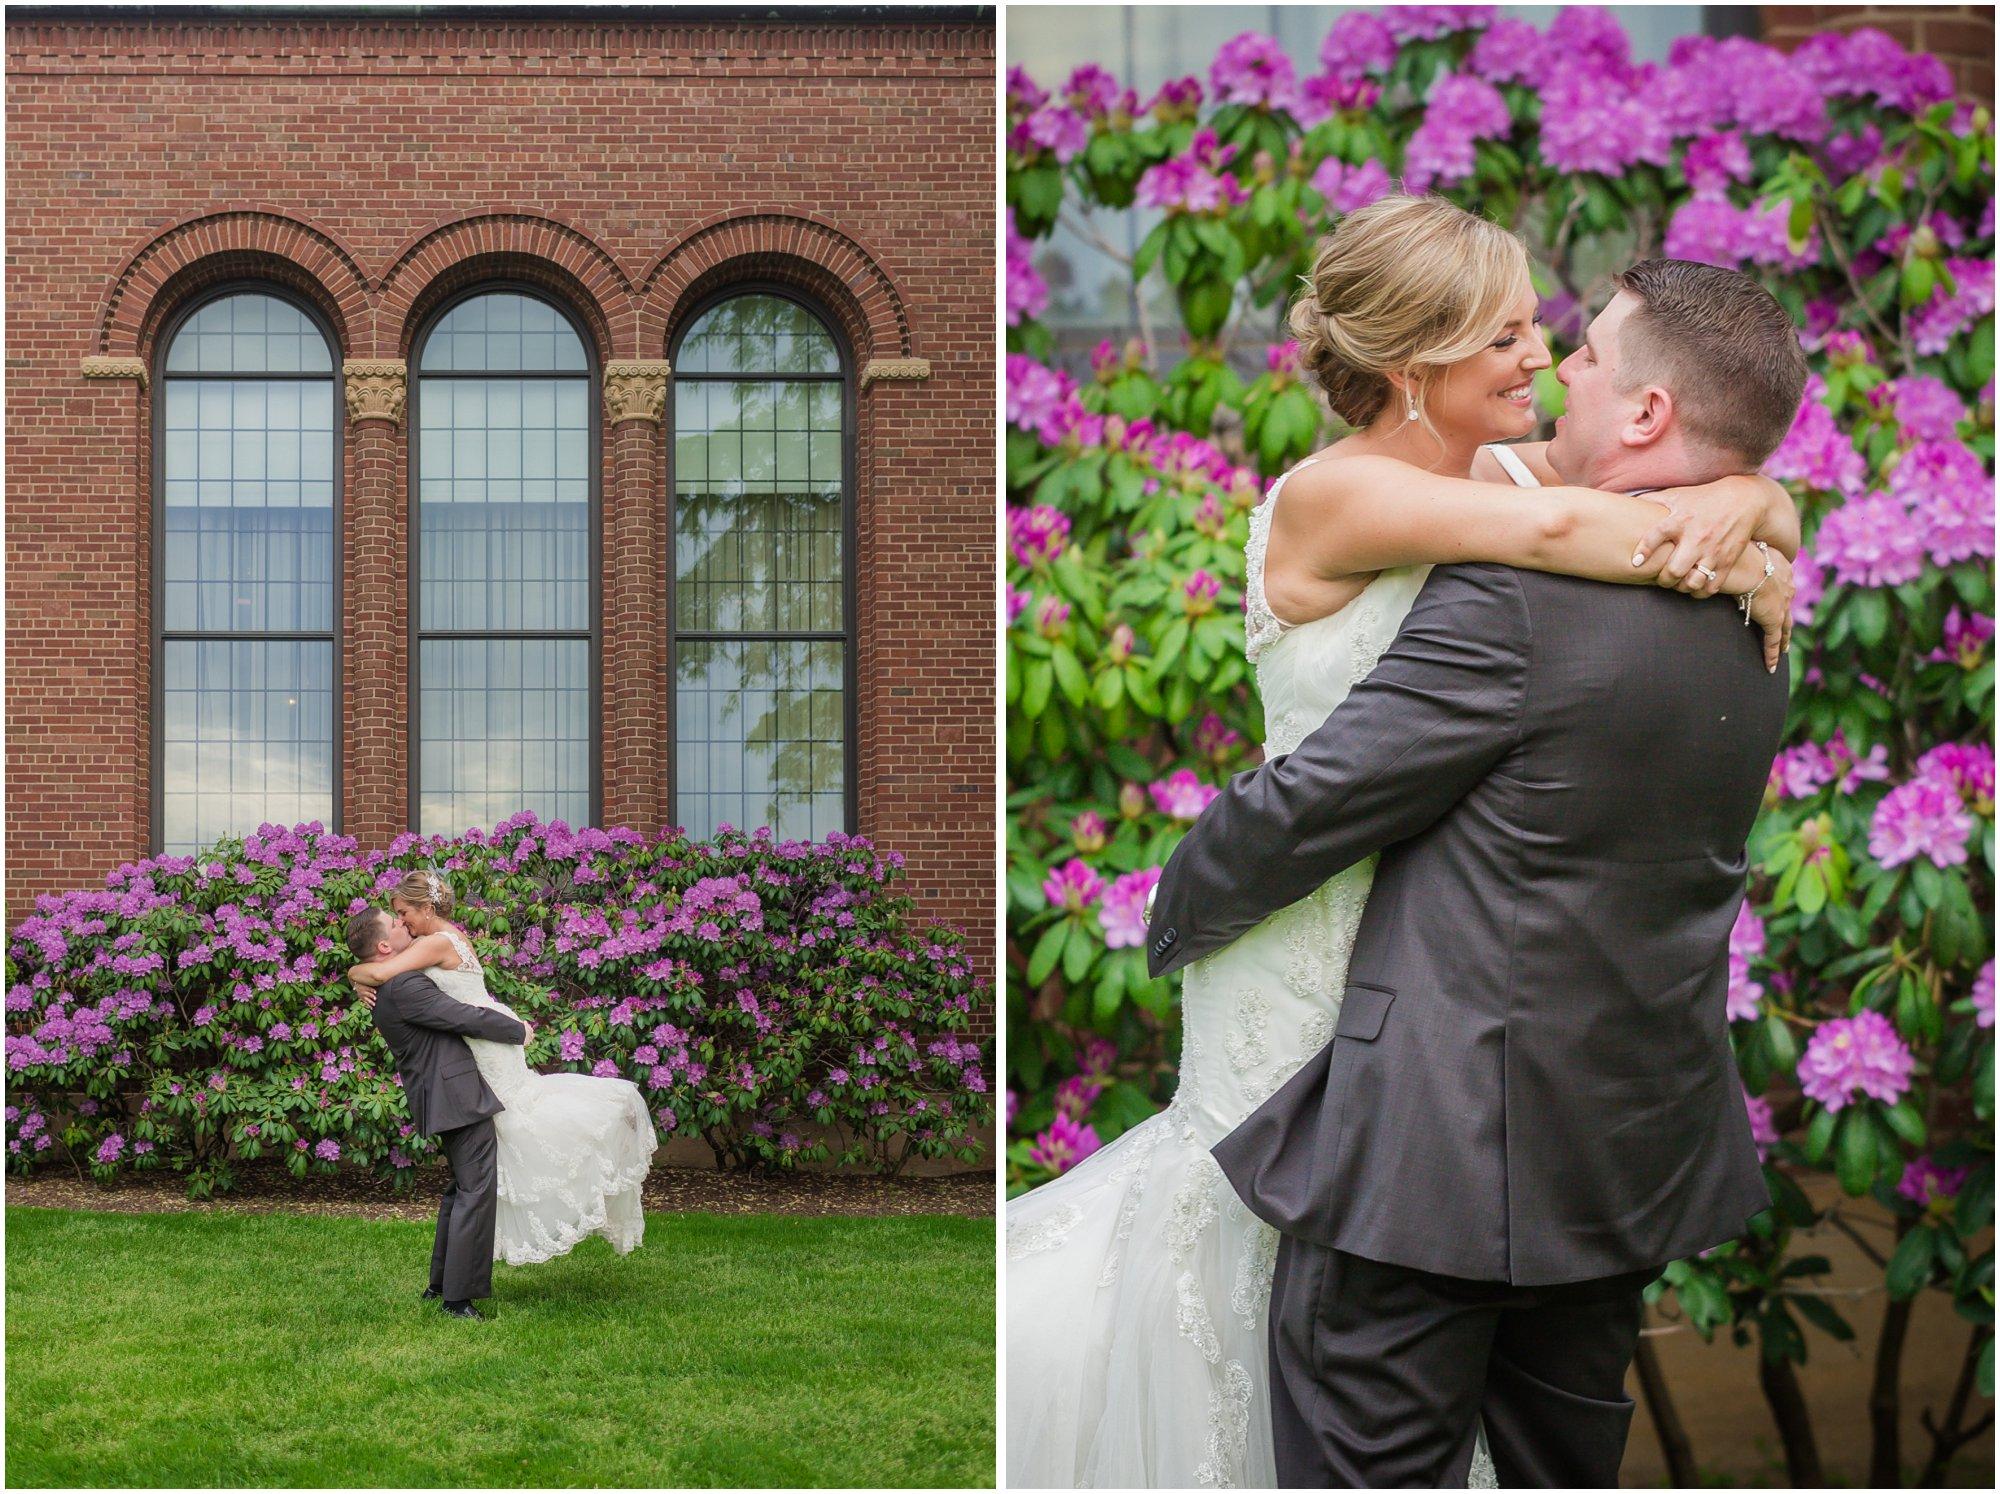 Plymouth_michigan_wedding_photographer_0428.jpg